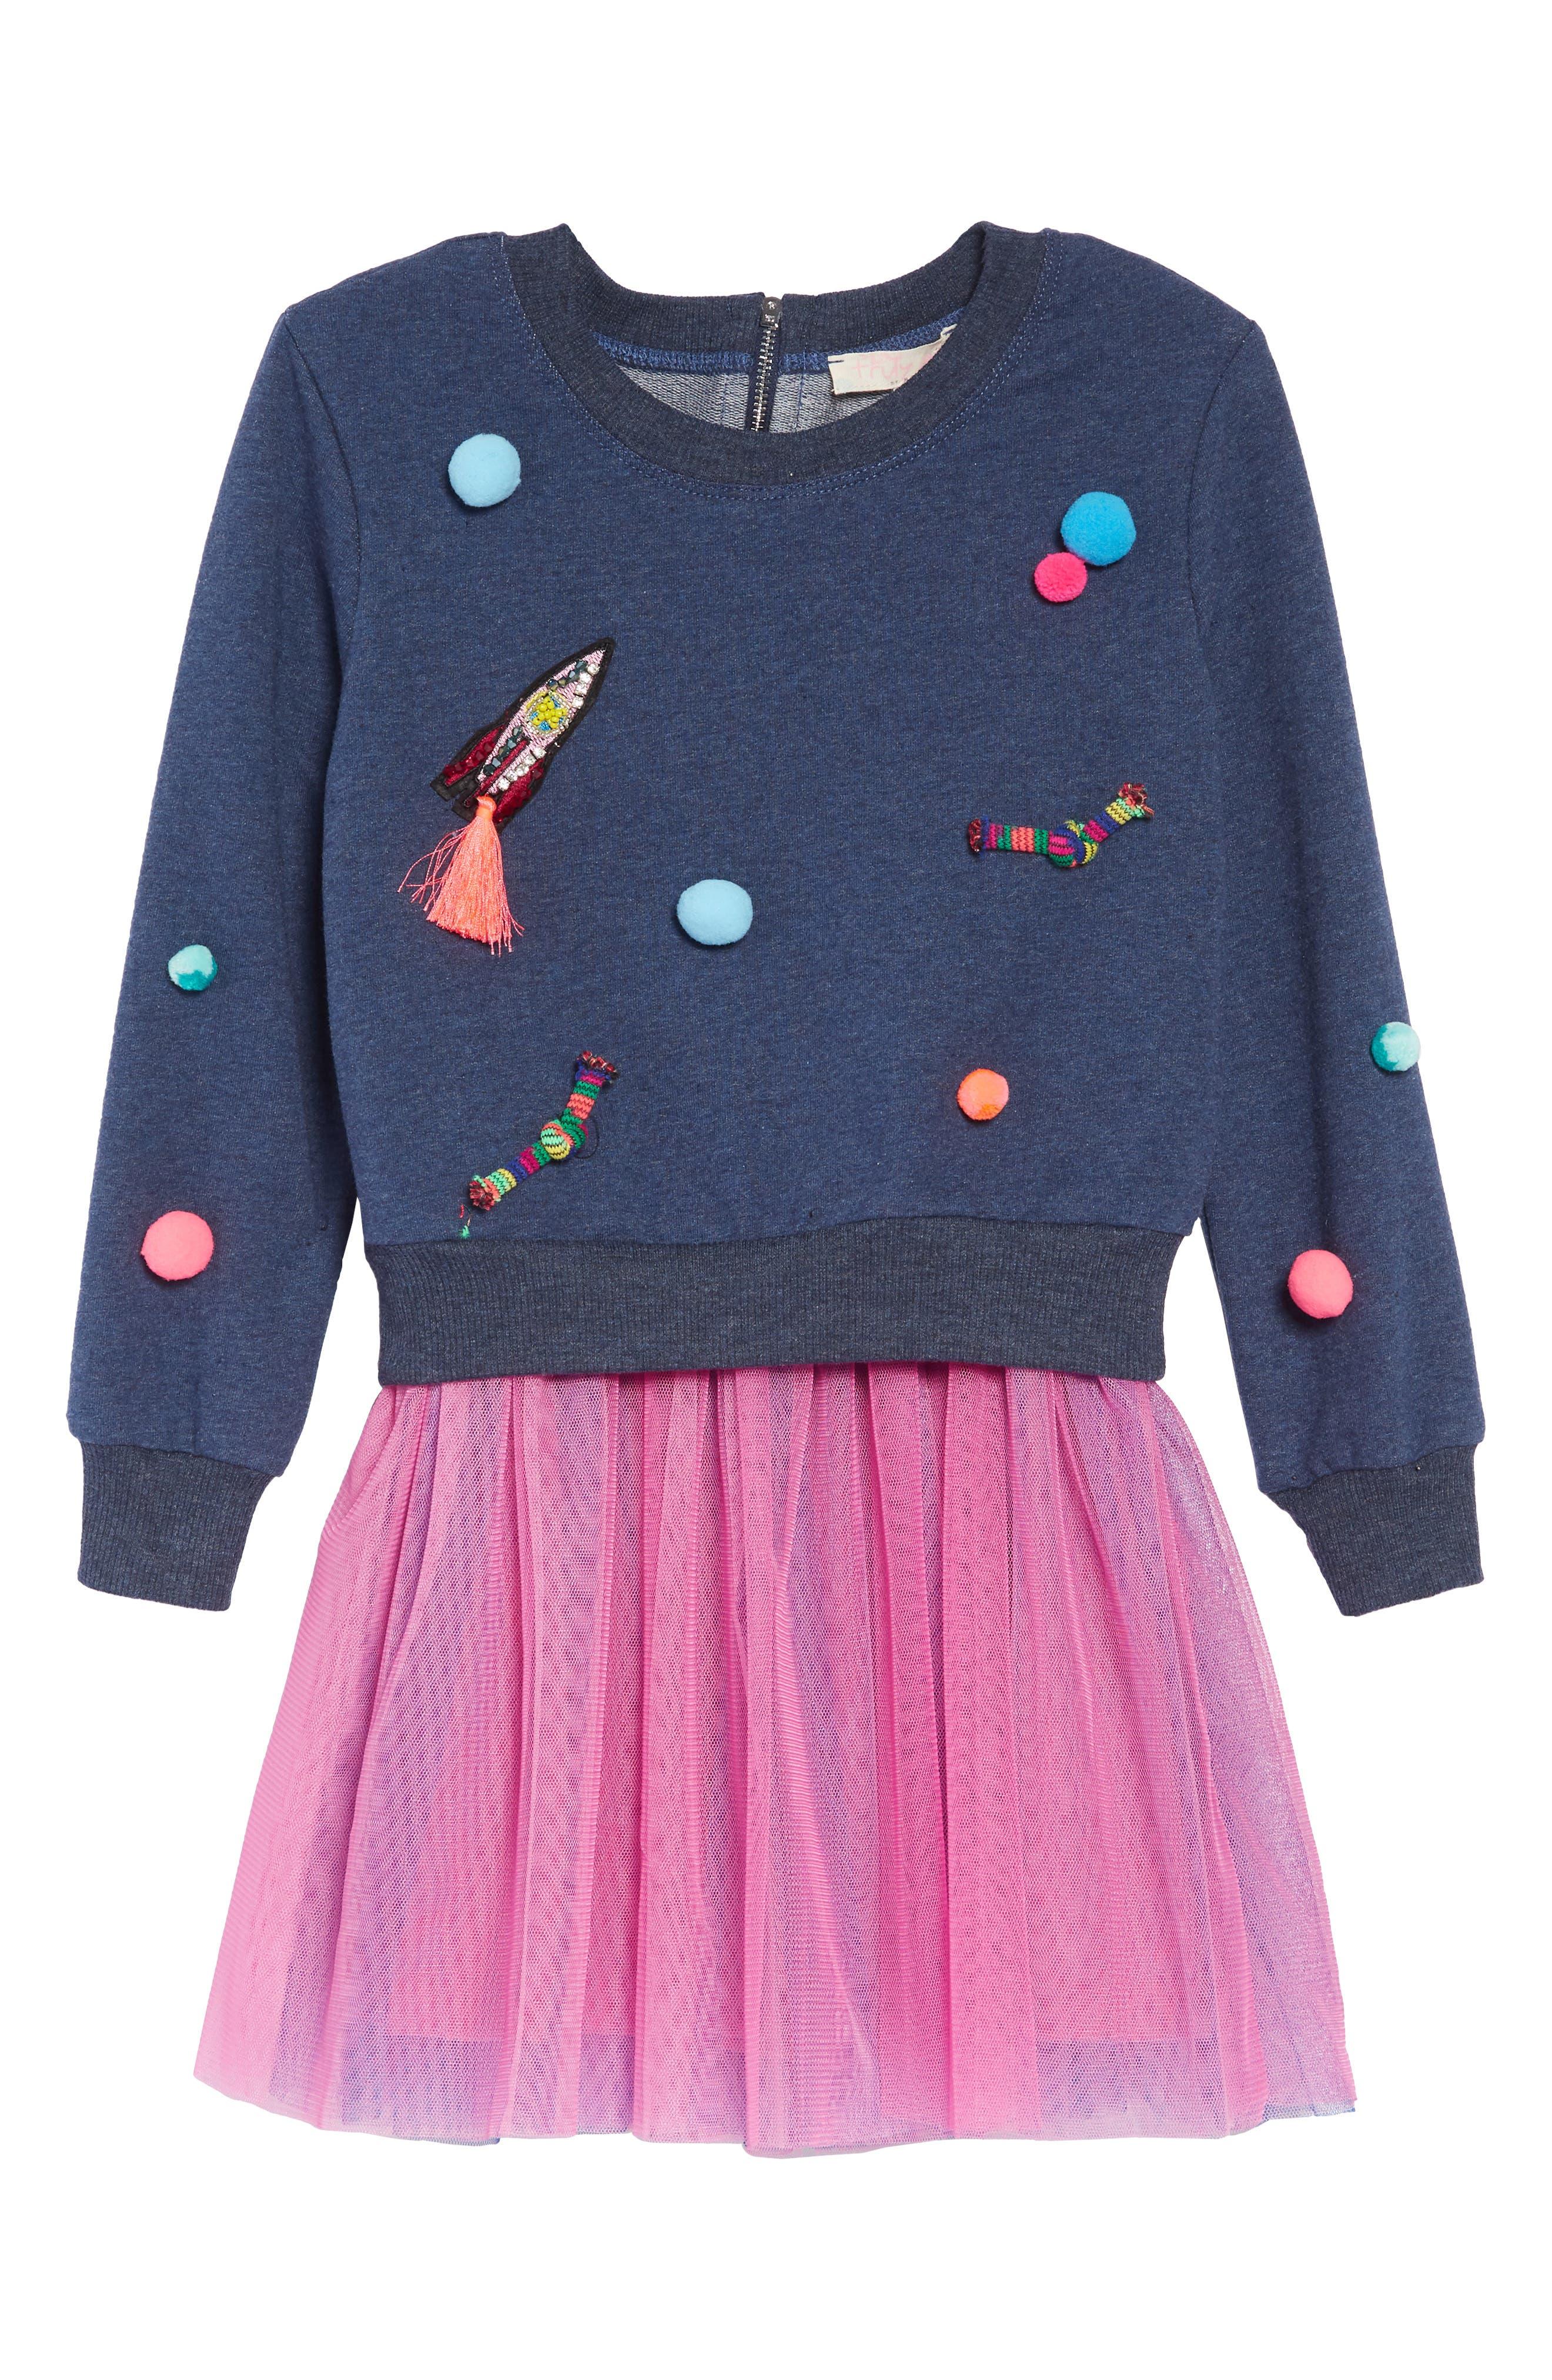 Appliqué Top & Tutu Dress Set,                         Main,                         color, 418